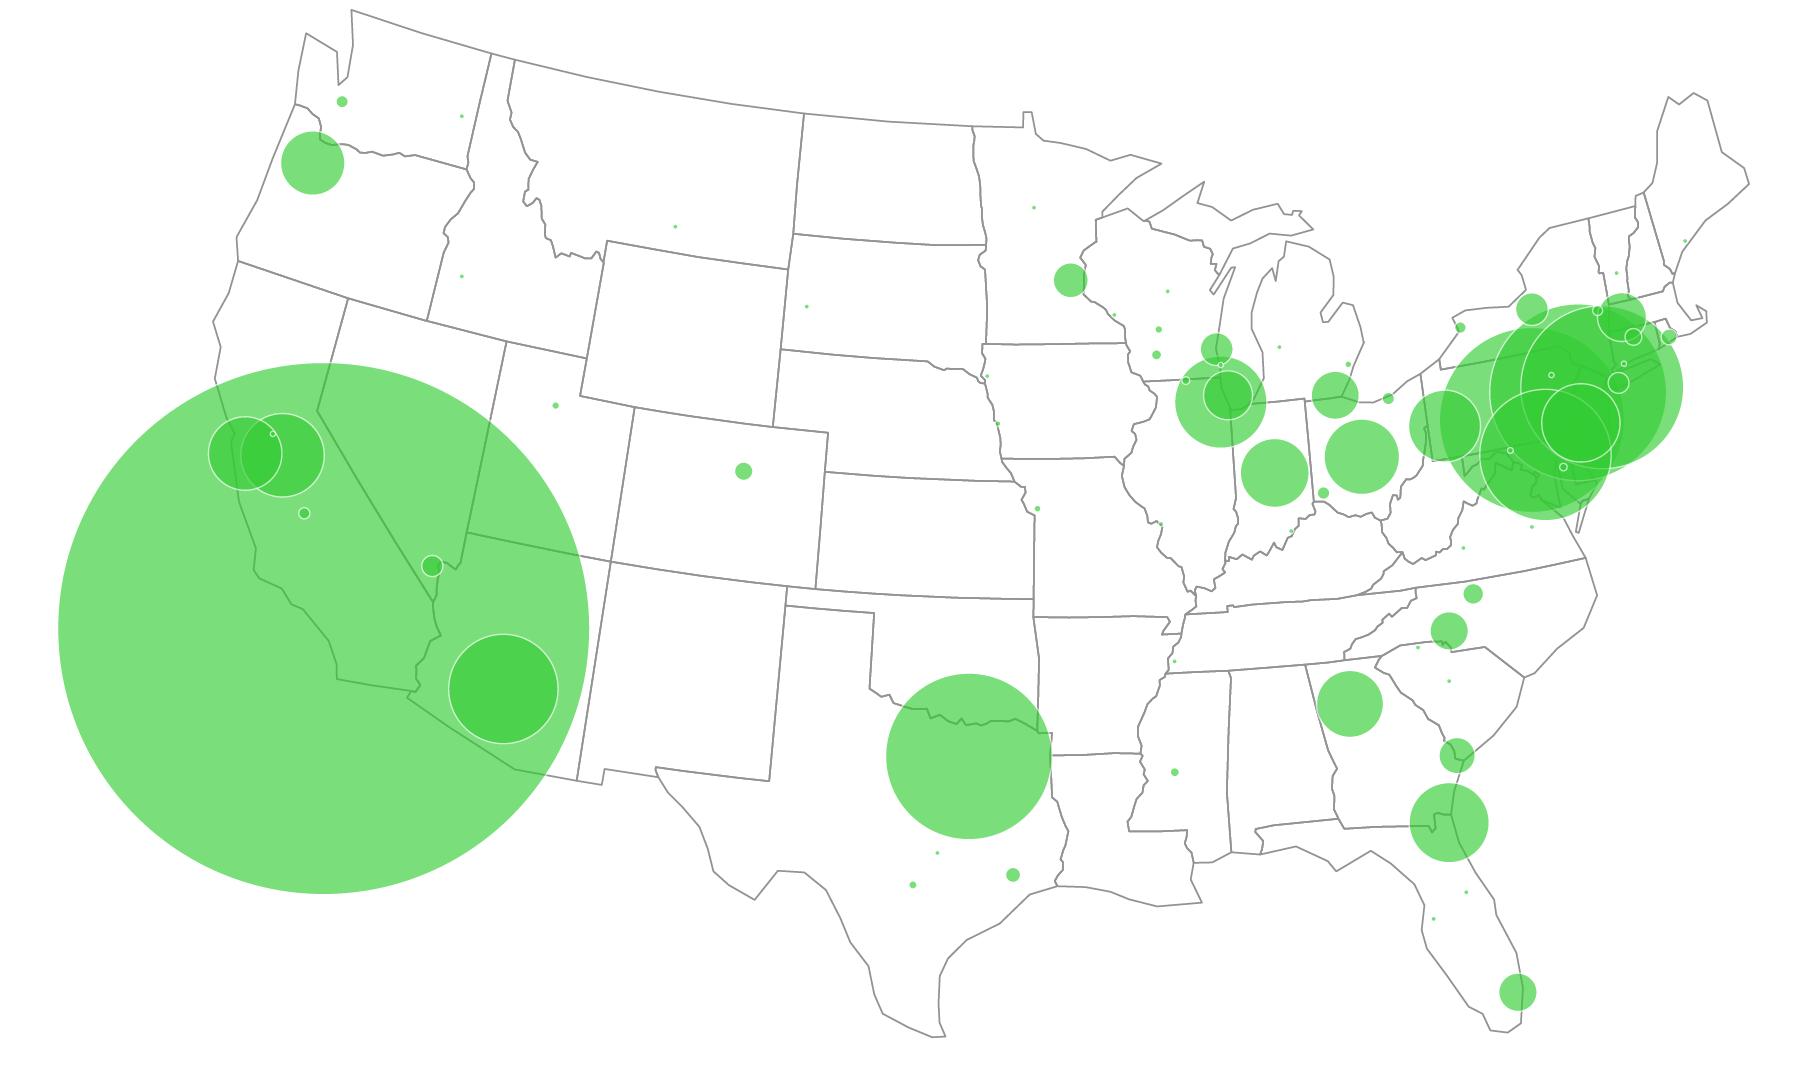 UPS Peak Season Local Freight Density in 2020